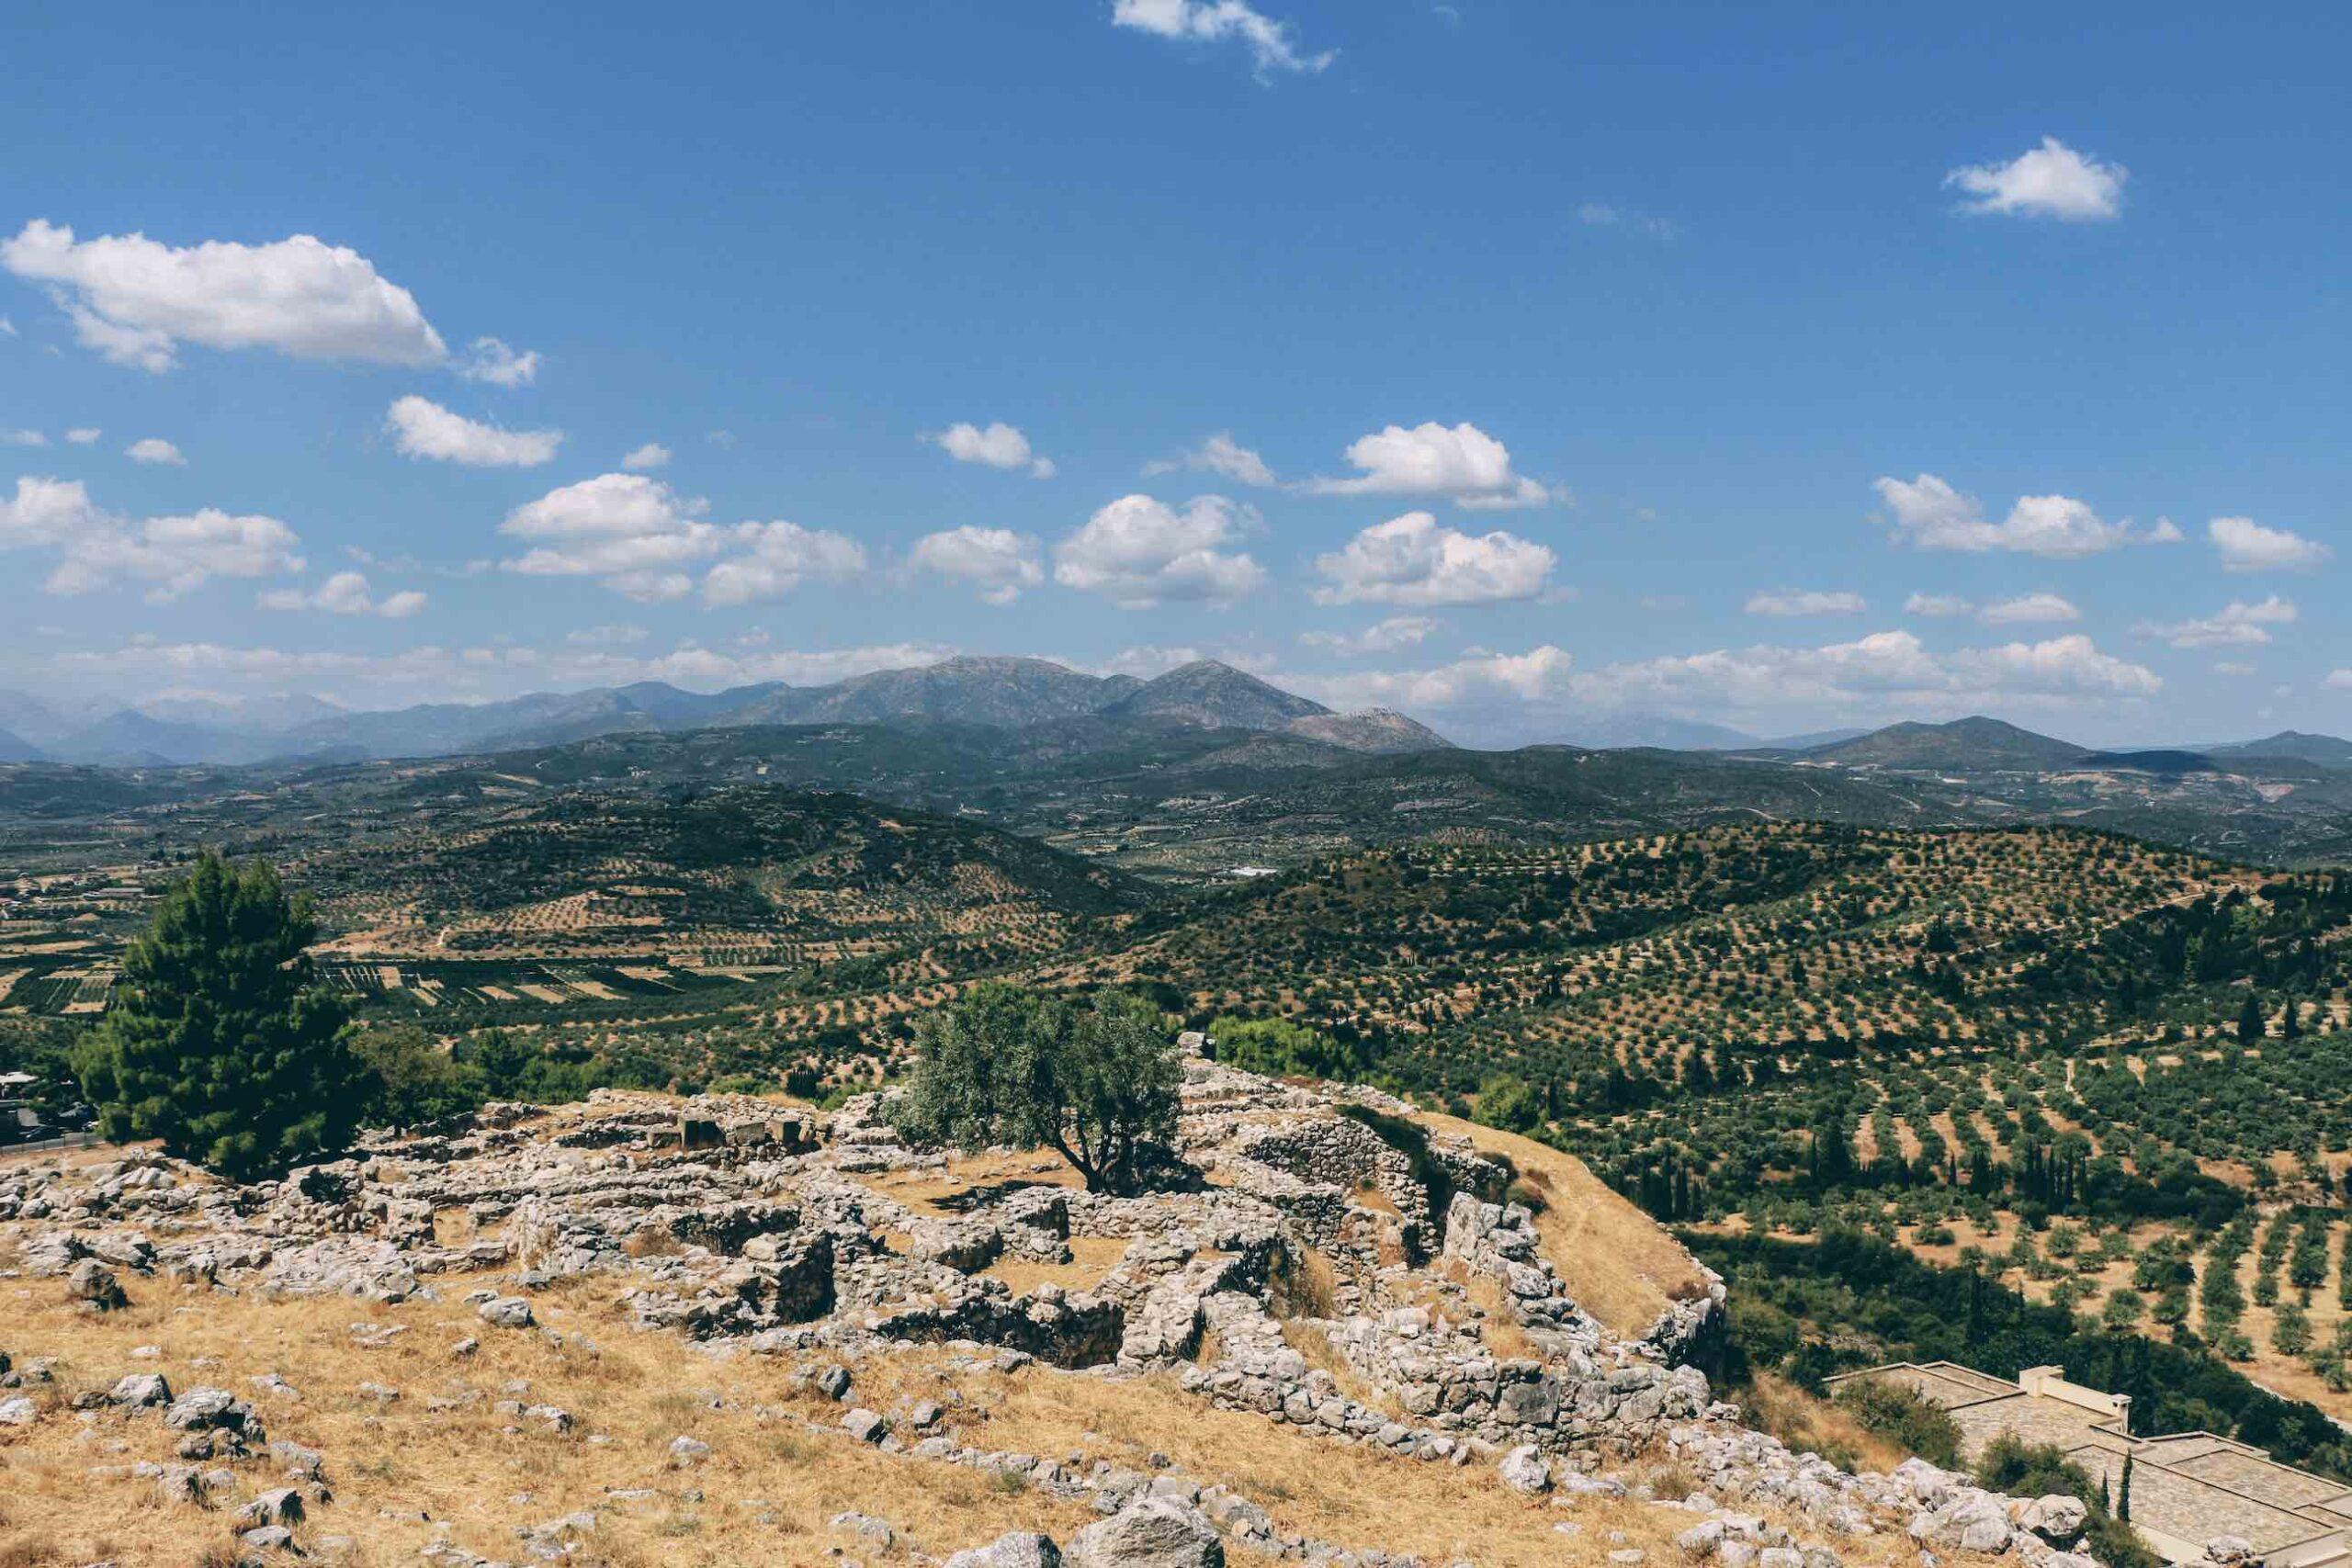 AA (11 hours): [Athens] Extraordinary Mycenae & Nafplio day trip